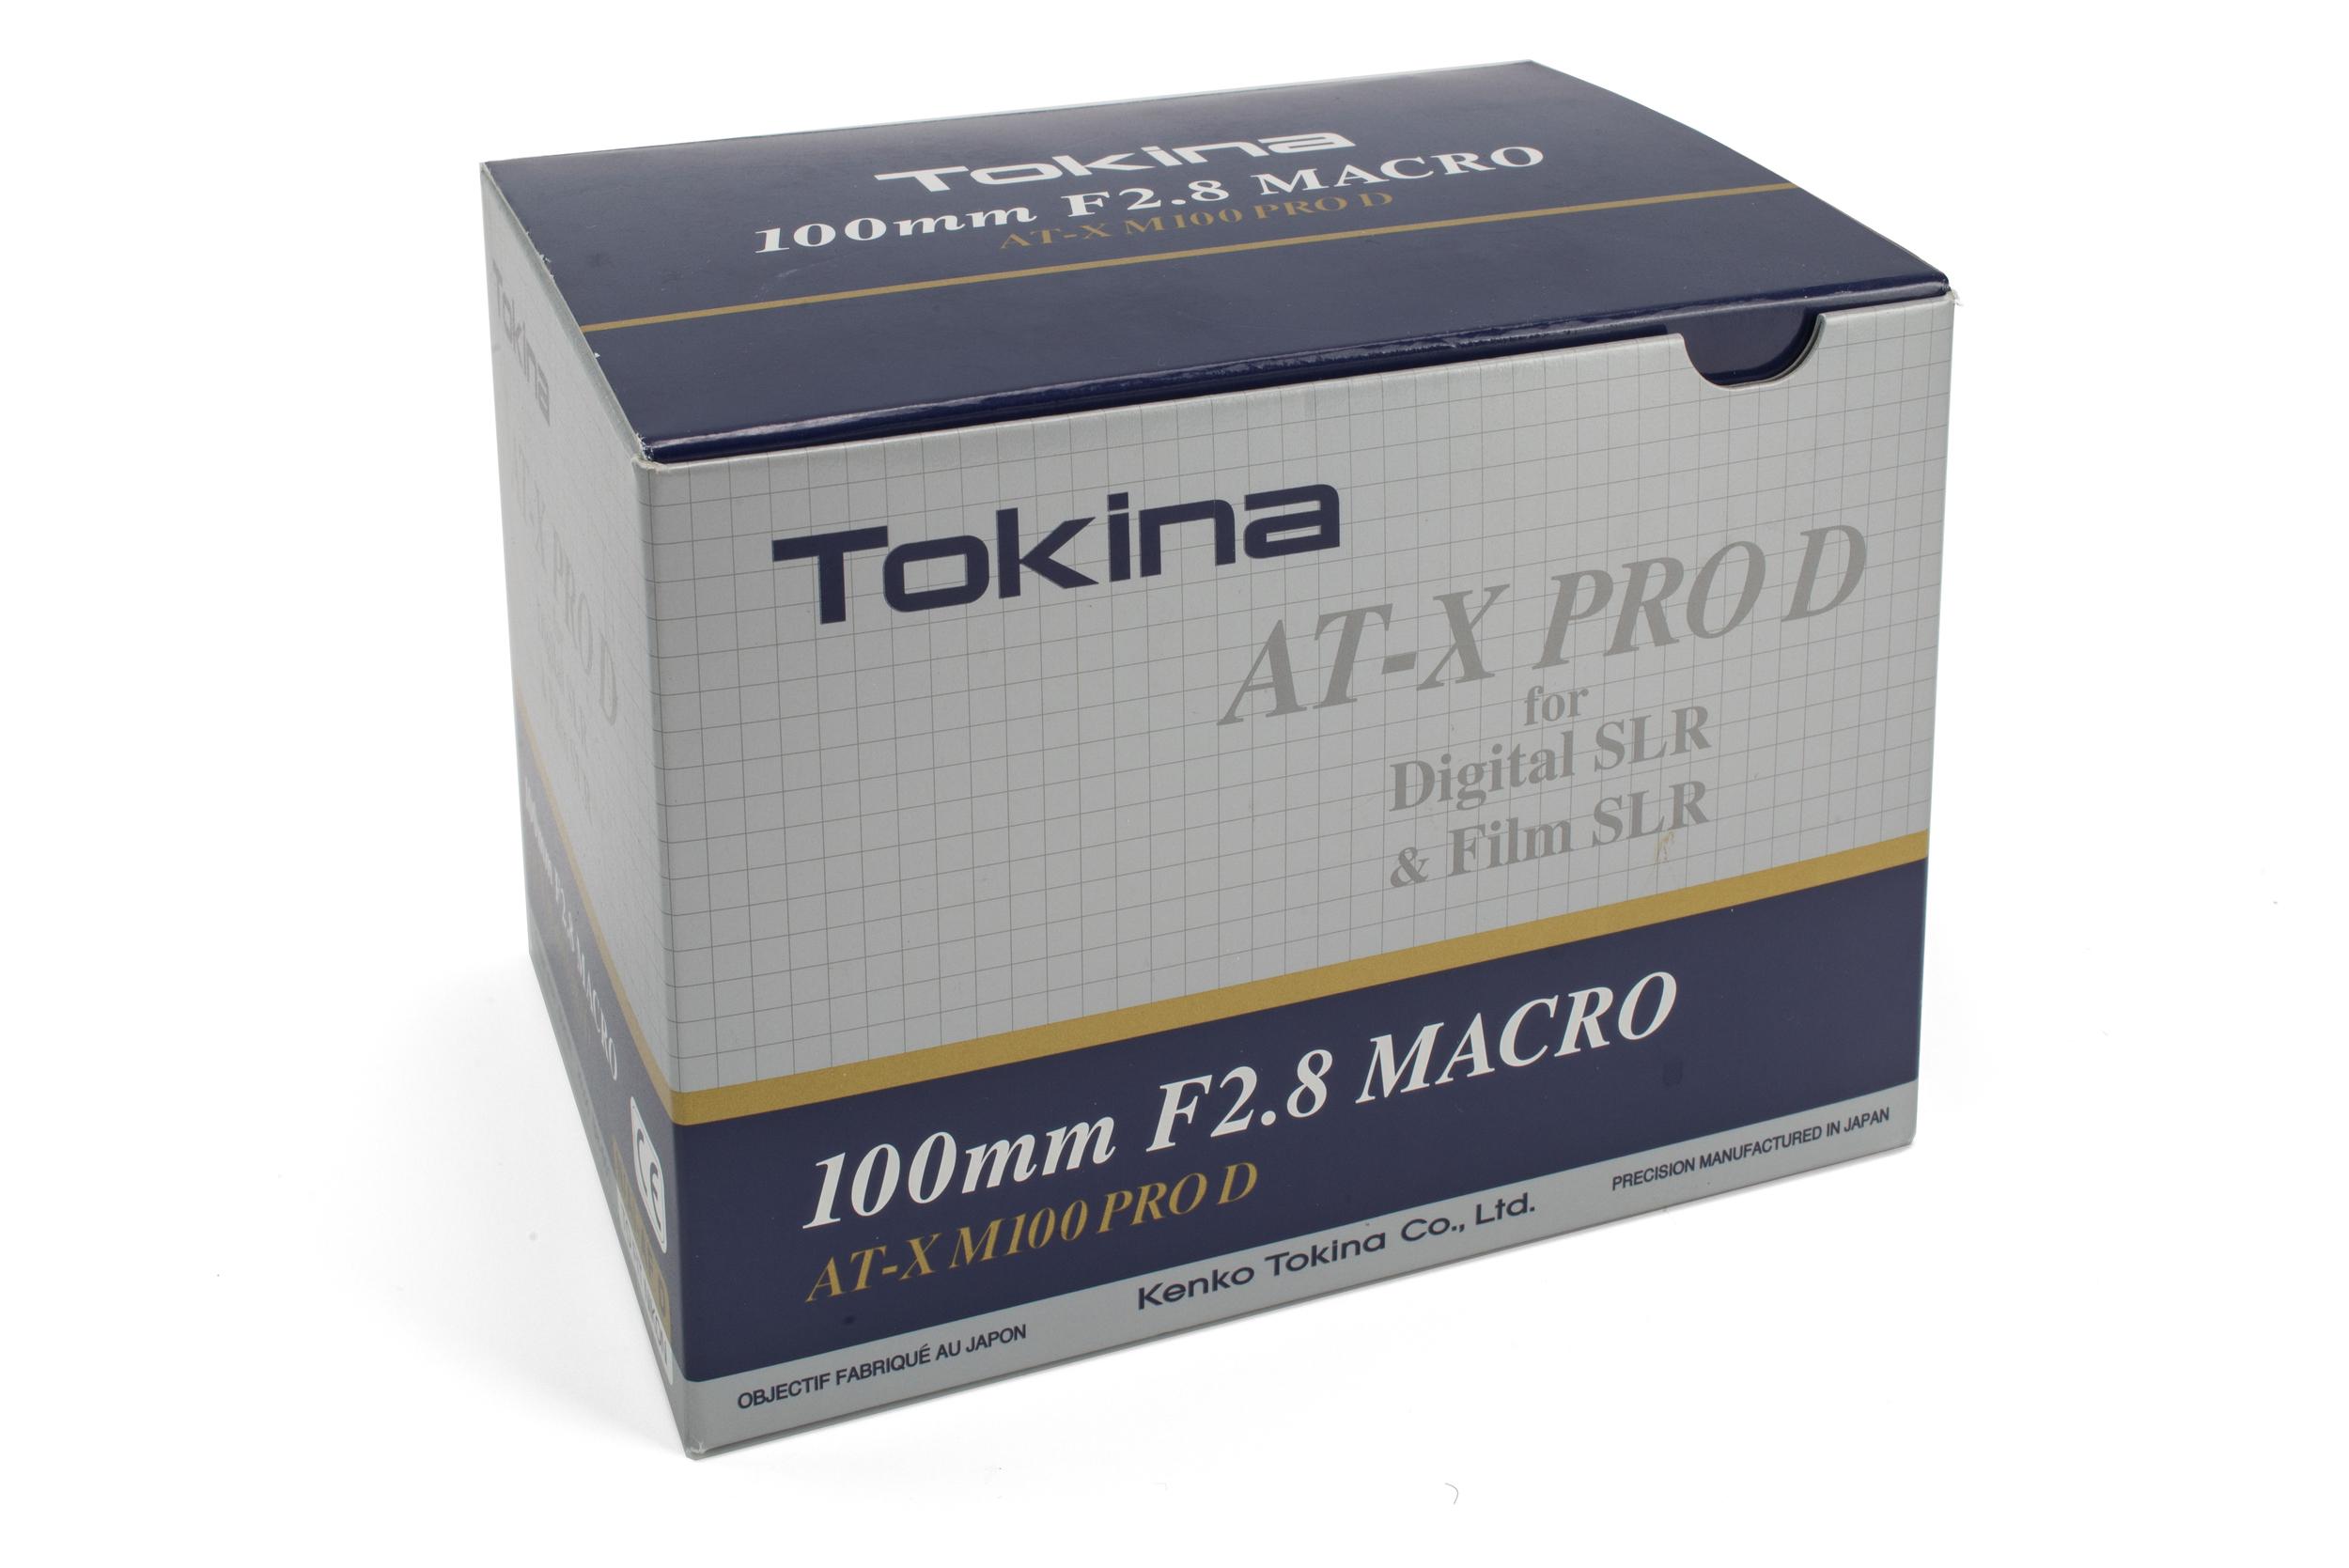 Packaging - Tokina 100mm f/2.8 Macro AT-X PRO D